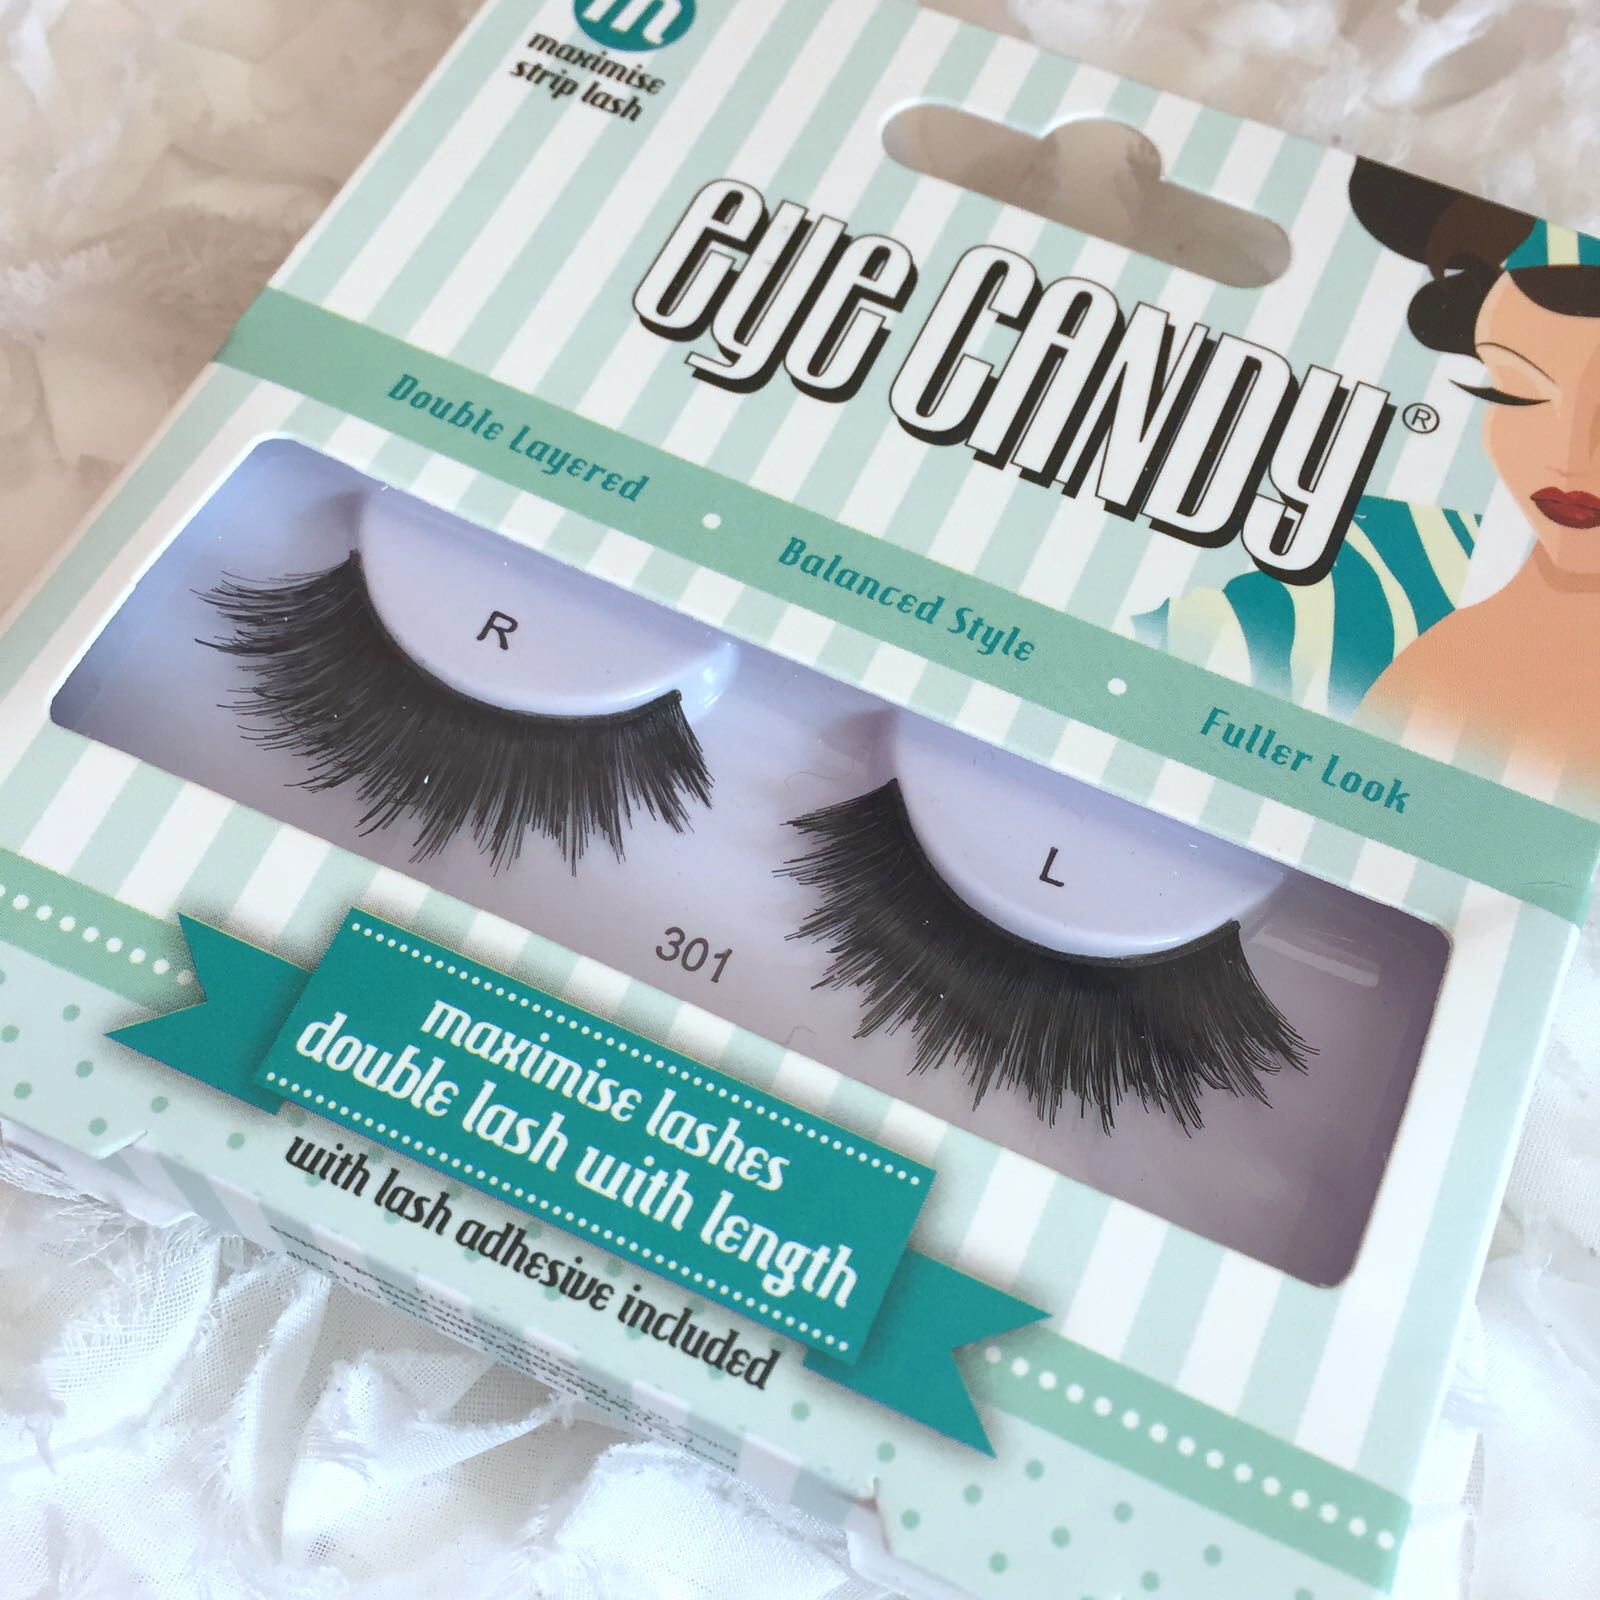 c6183833c5e Eye Candy False Lashes - Review - Mammaful Zo: Beauty, Fashion ...